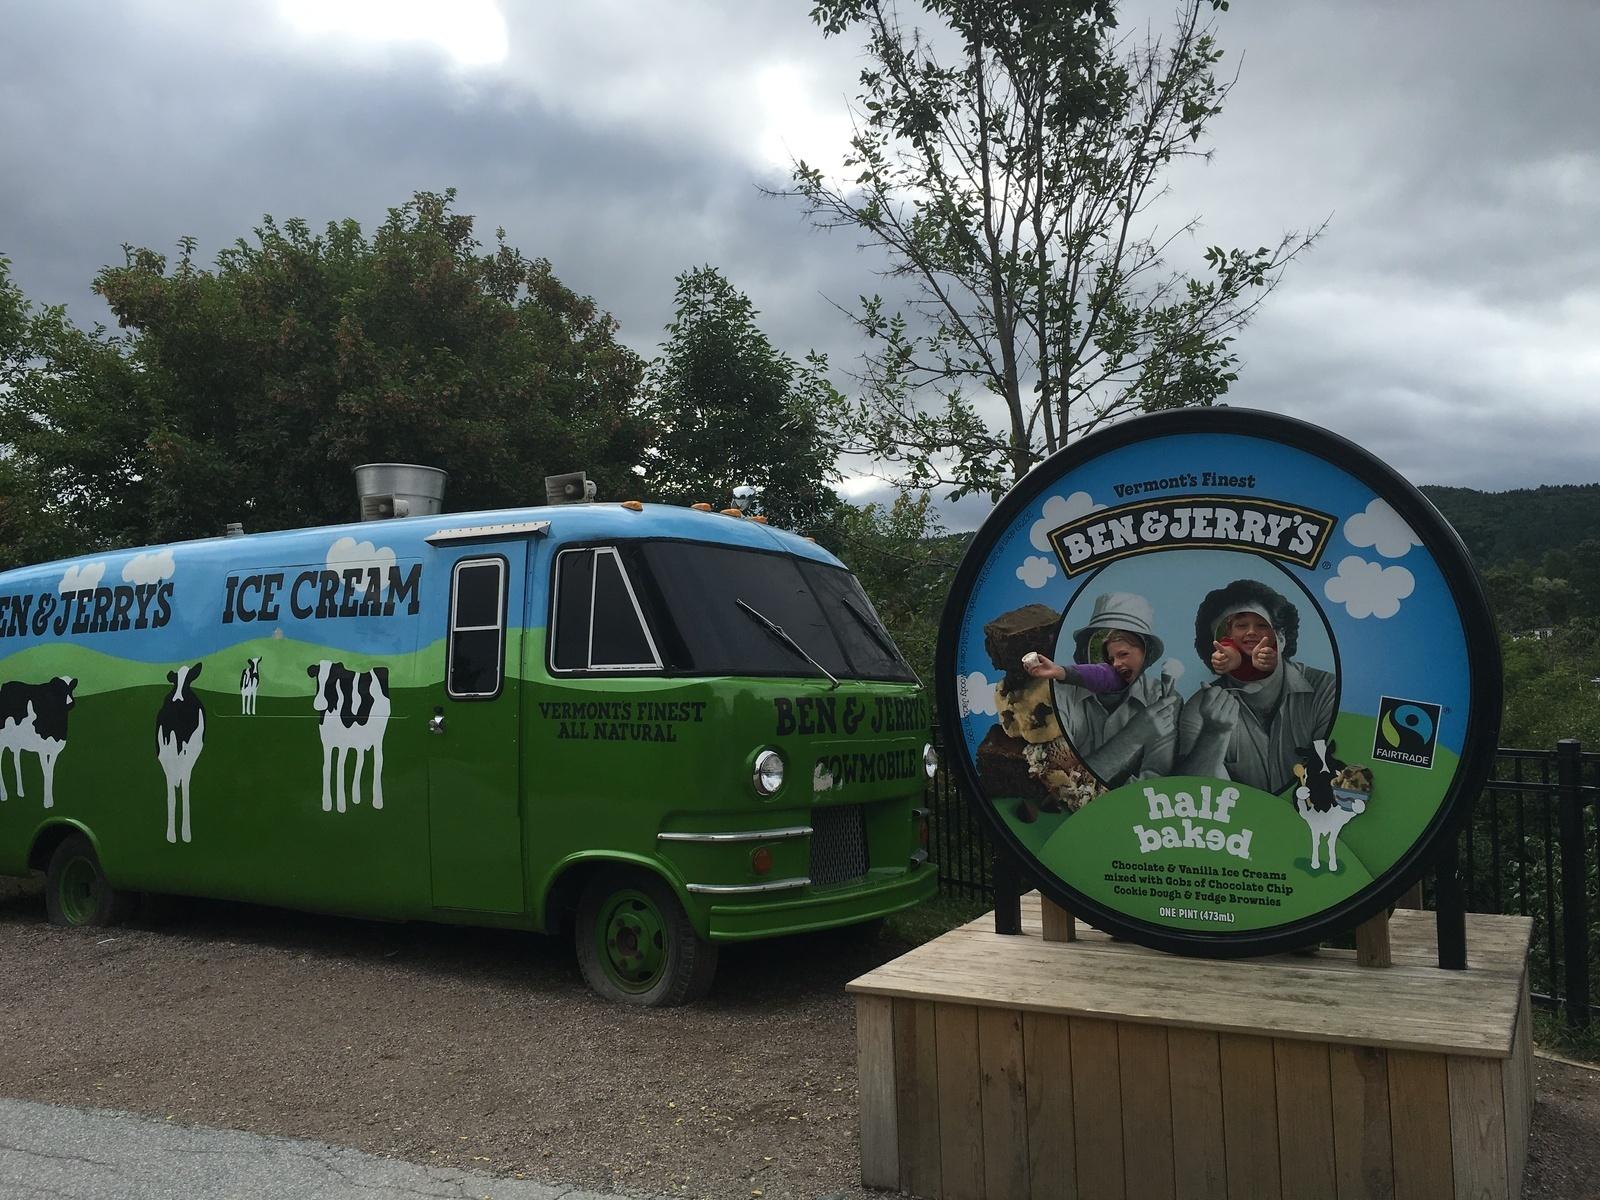 Ben & Jerry's Ice Cream Factory  - Waterbury Center, Vermont